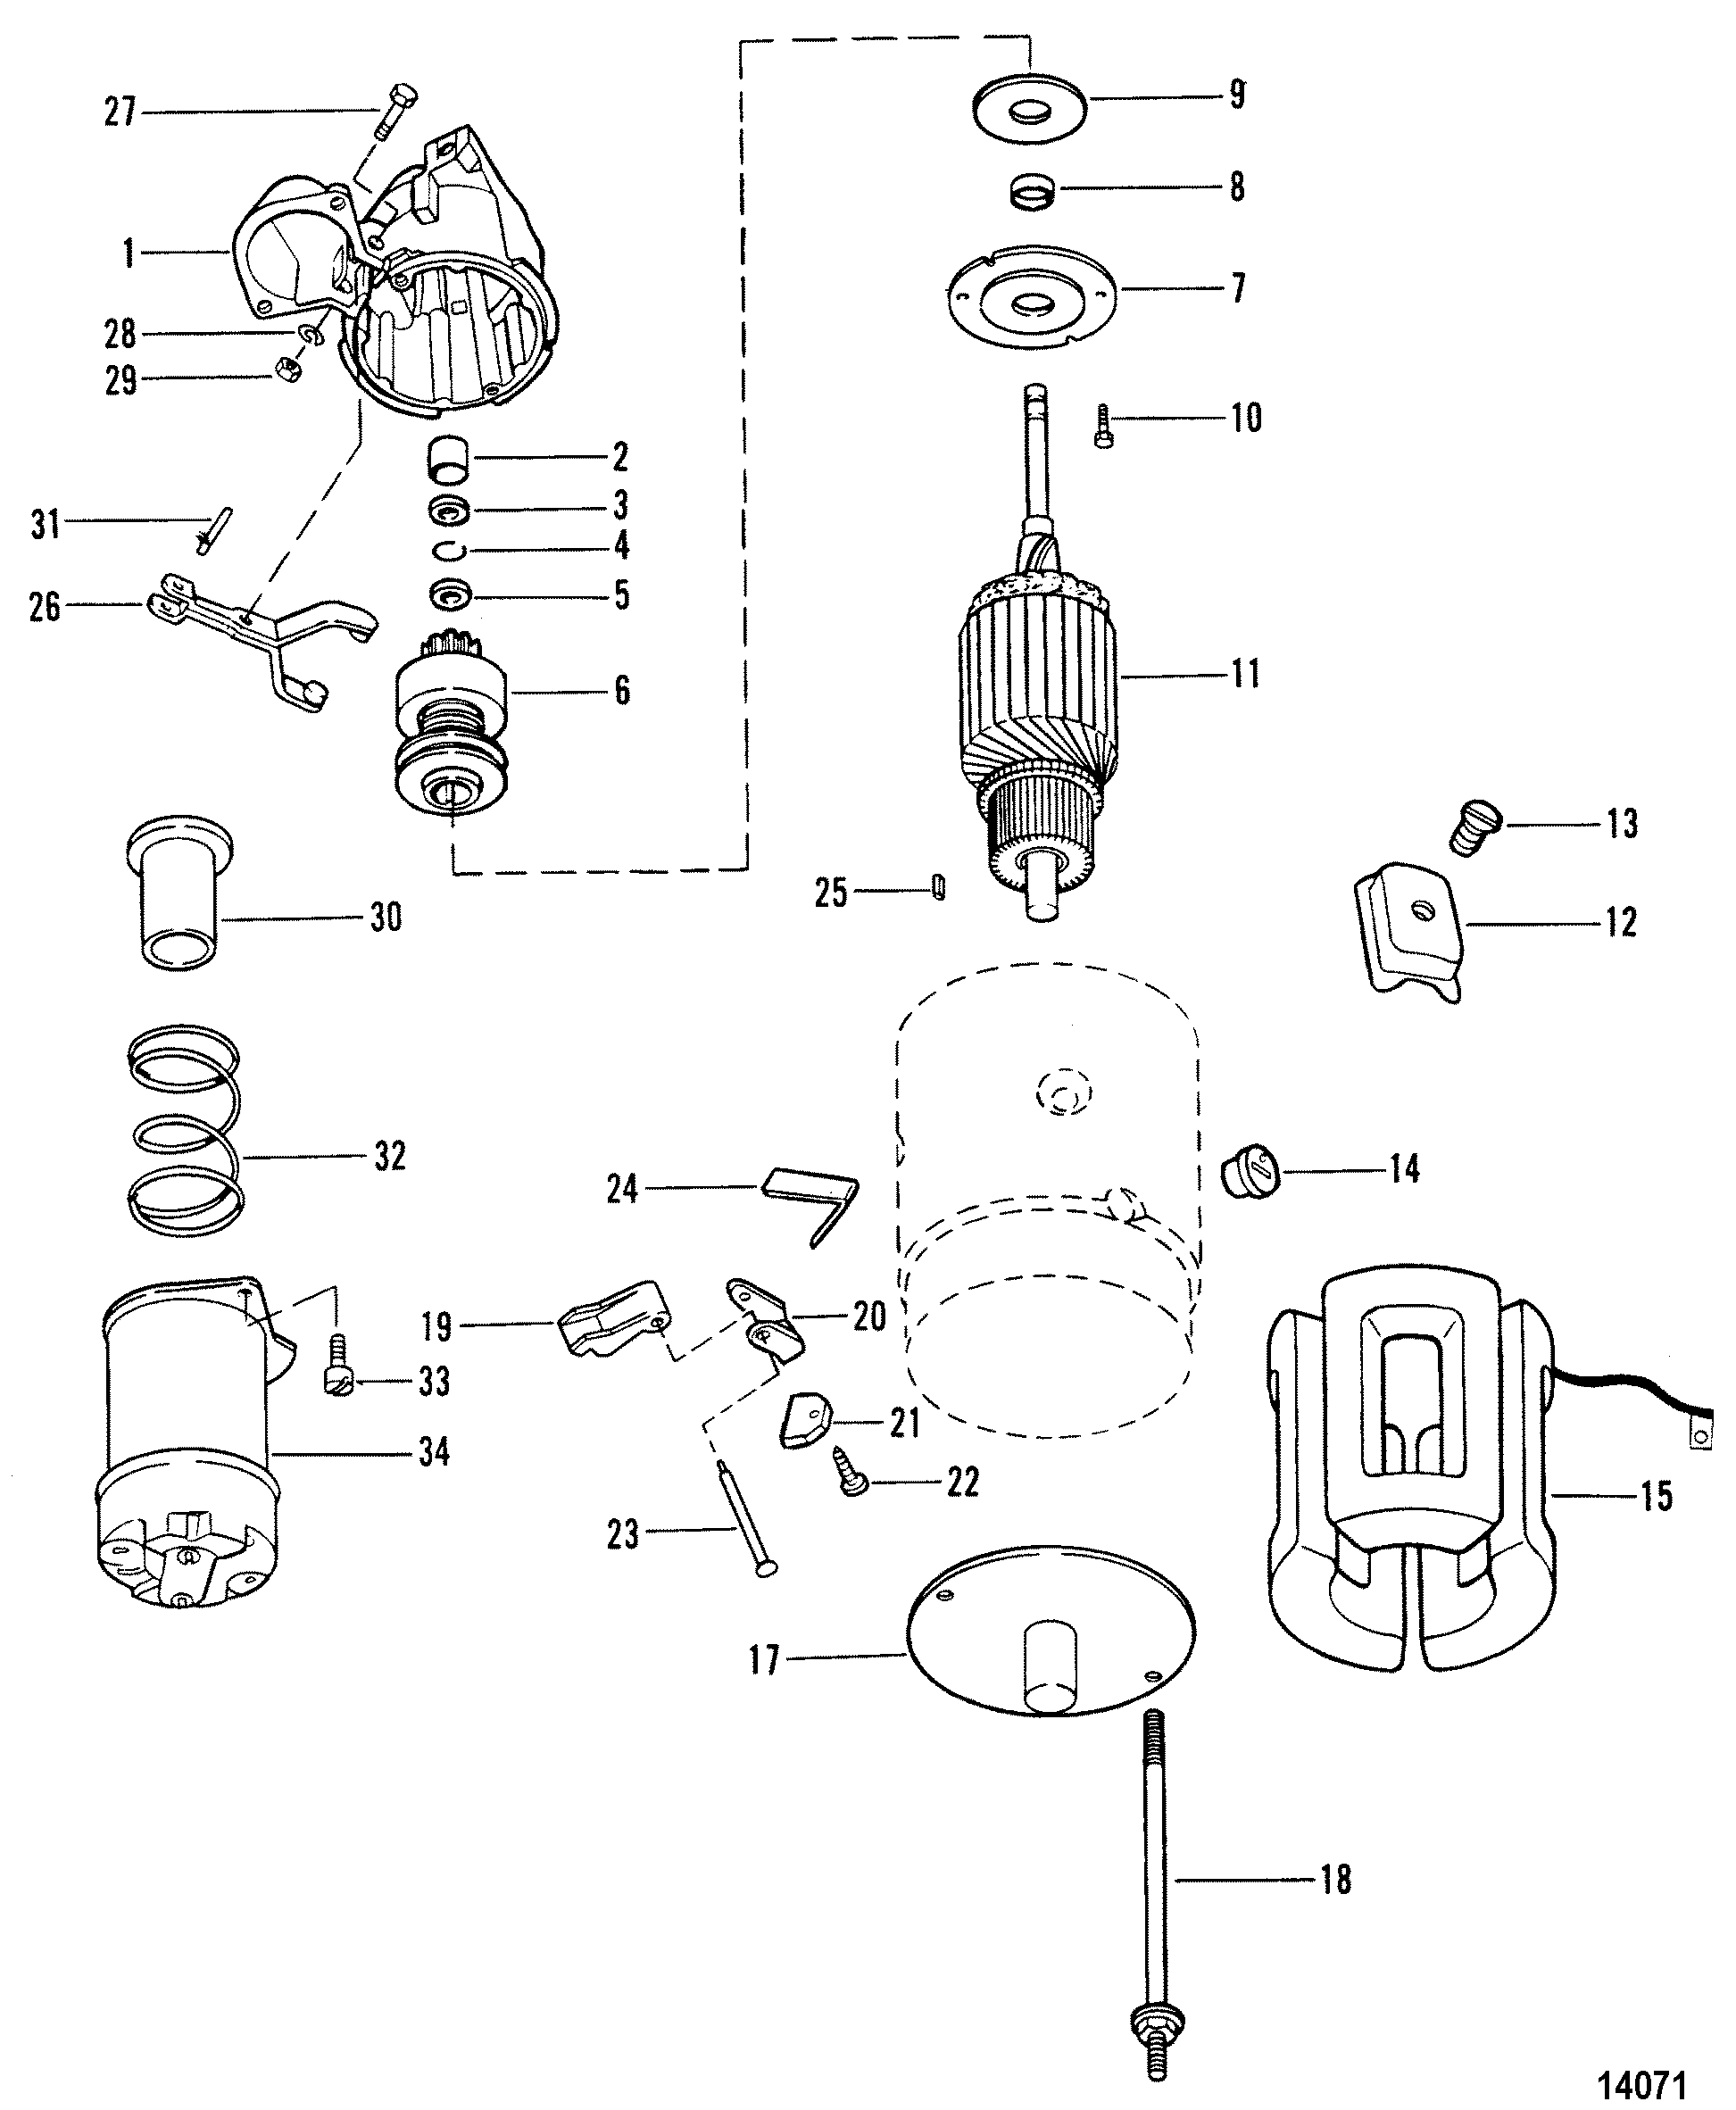 ignition wiring diagram 1999 mercruiser 4 3 vortec v6